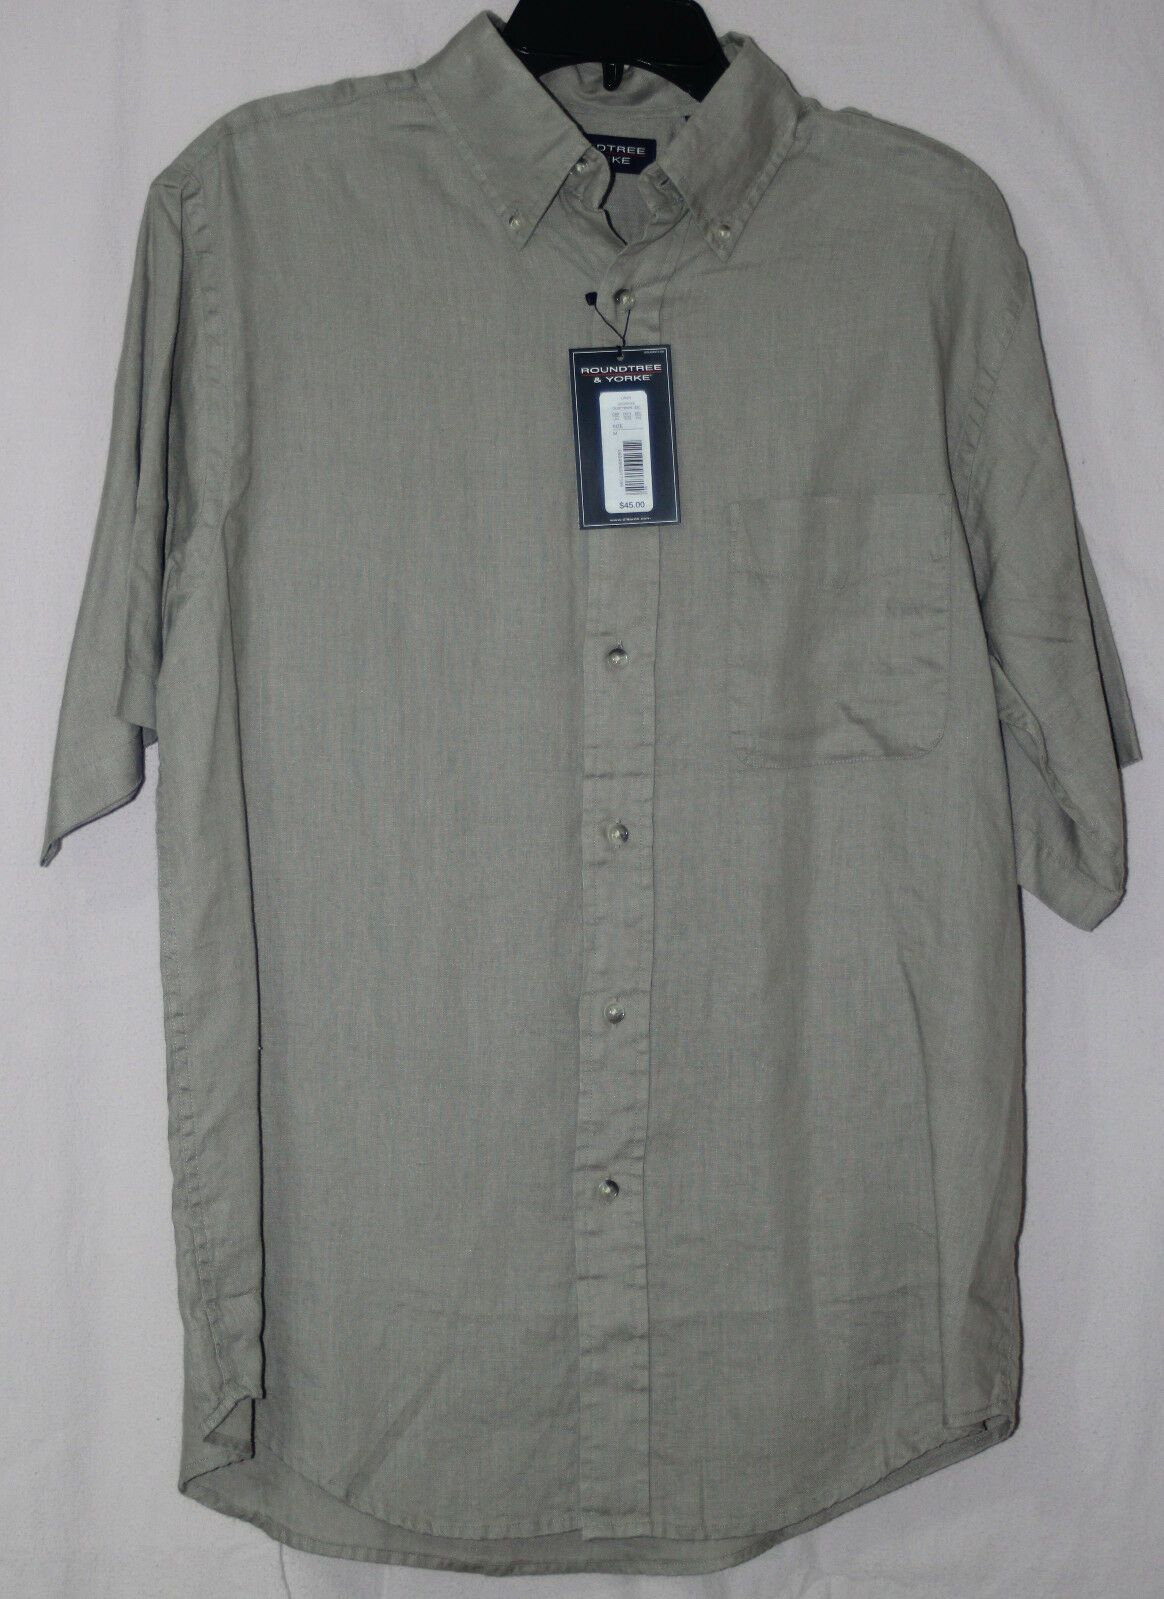 Roundtree Yorke Men S Short Sleeve Button Linen Shirt 100 Linen Men S Size M L Xl Orange And Various Shirts Linen Shorts Men Short Sleeve